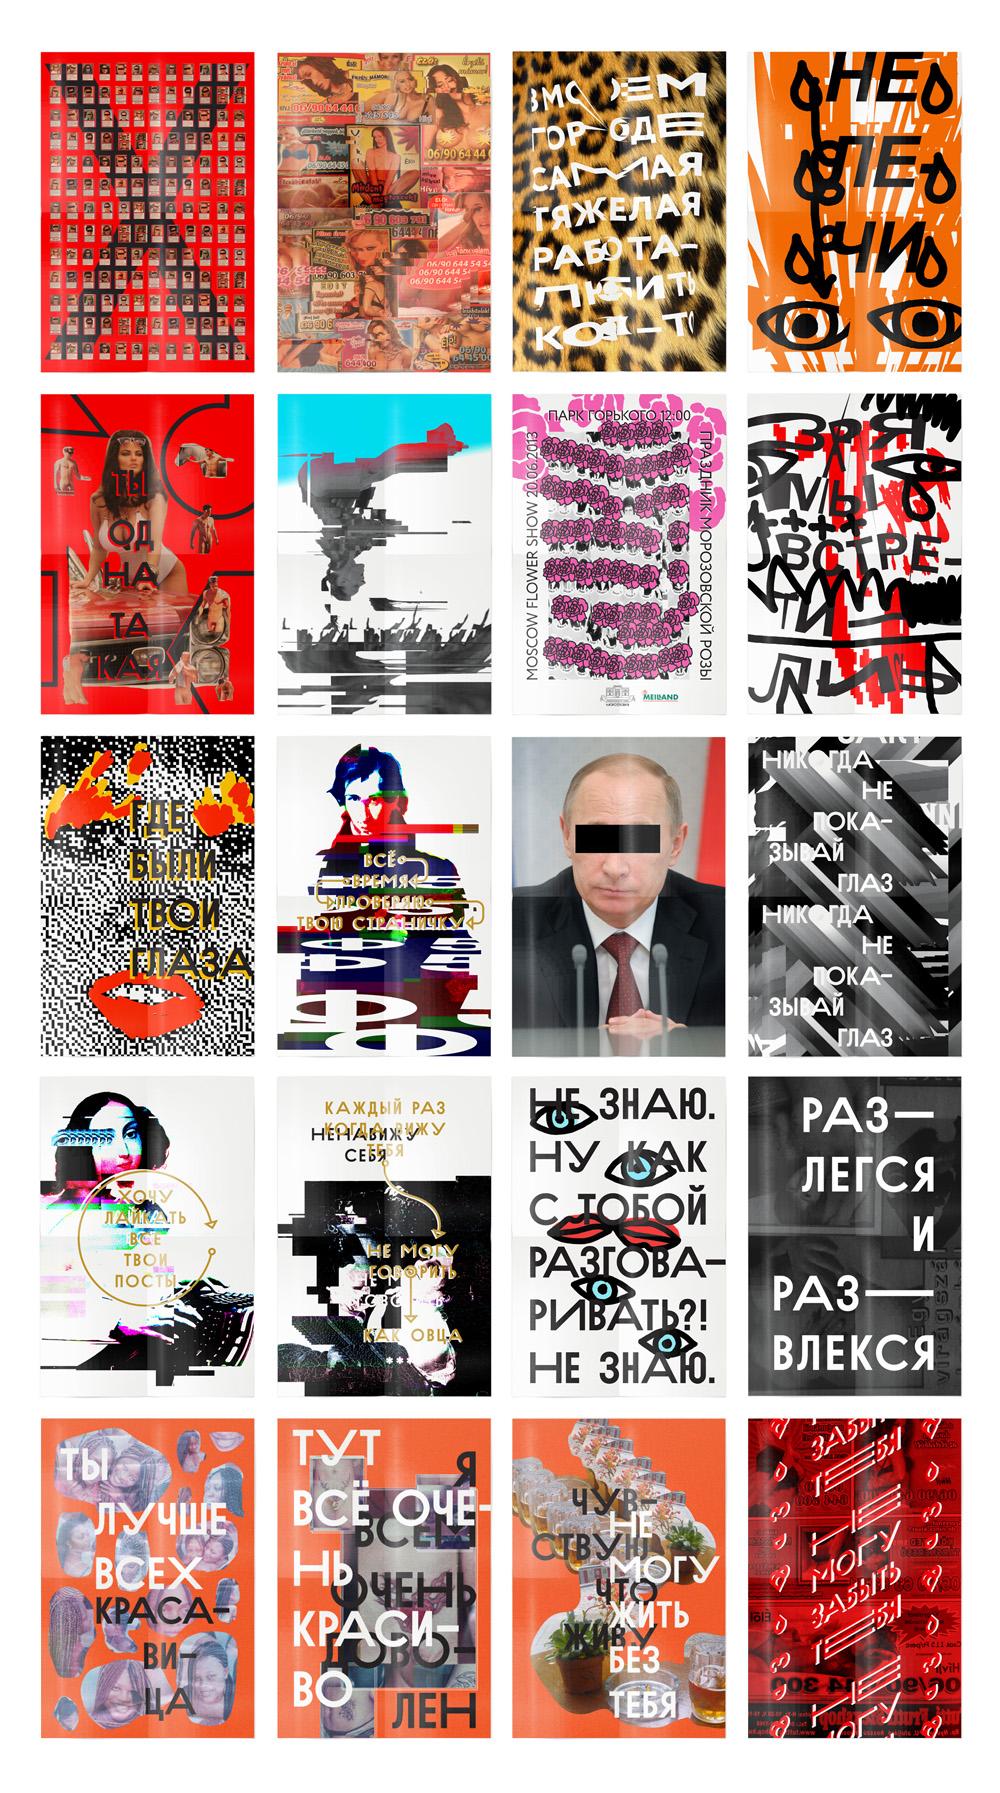 Monobrow_posters